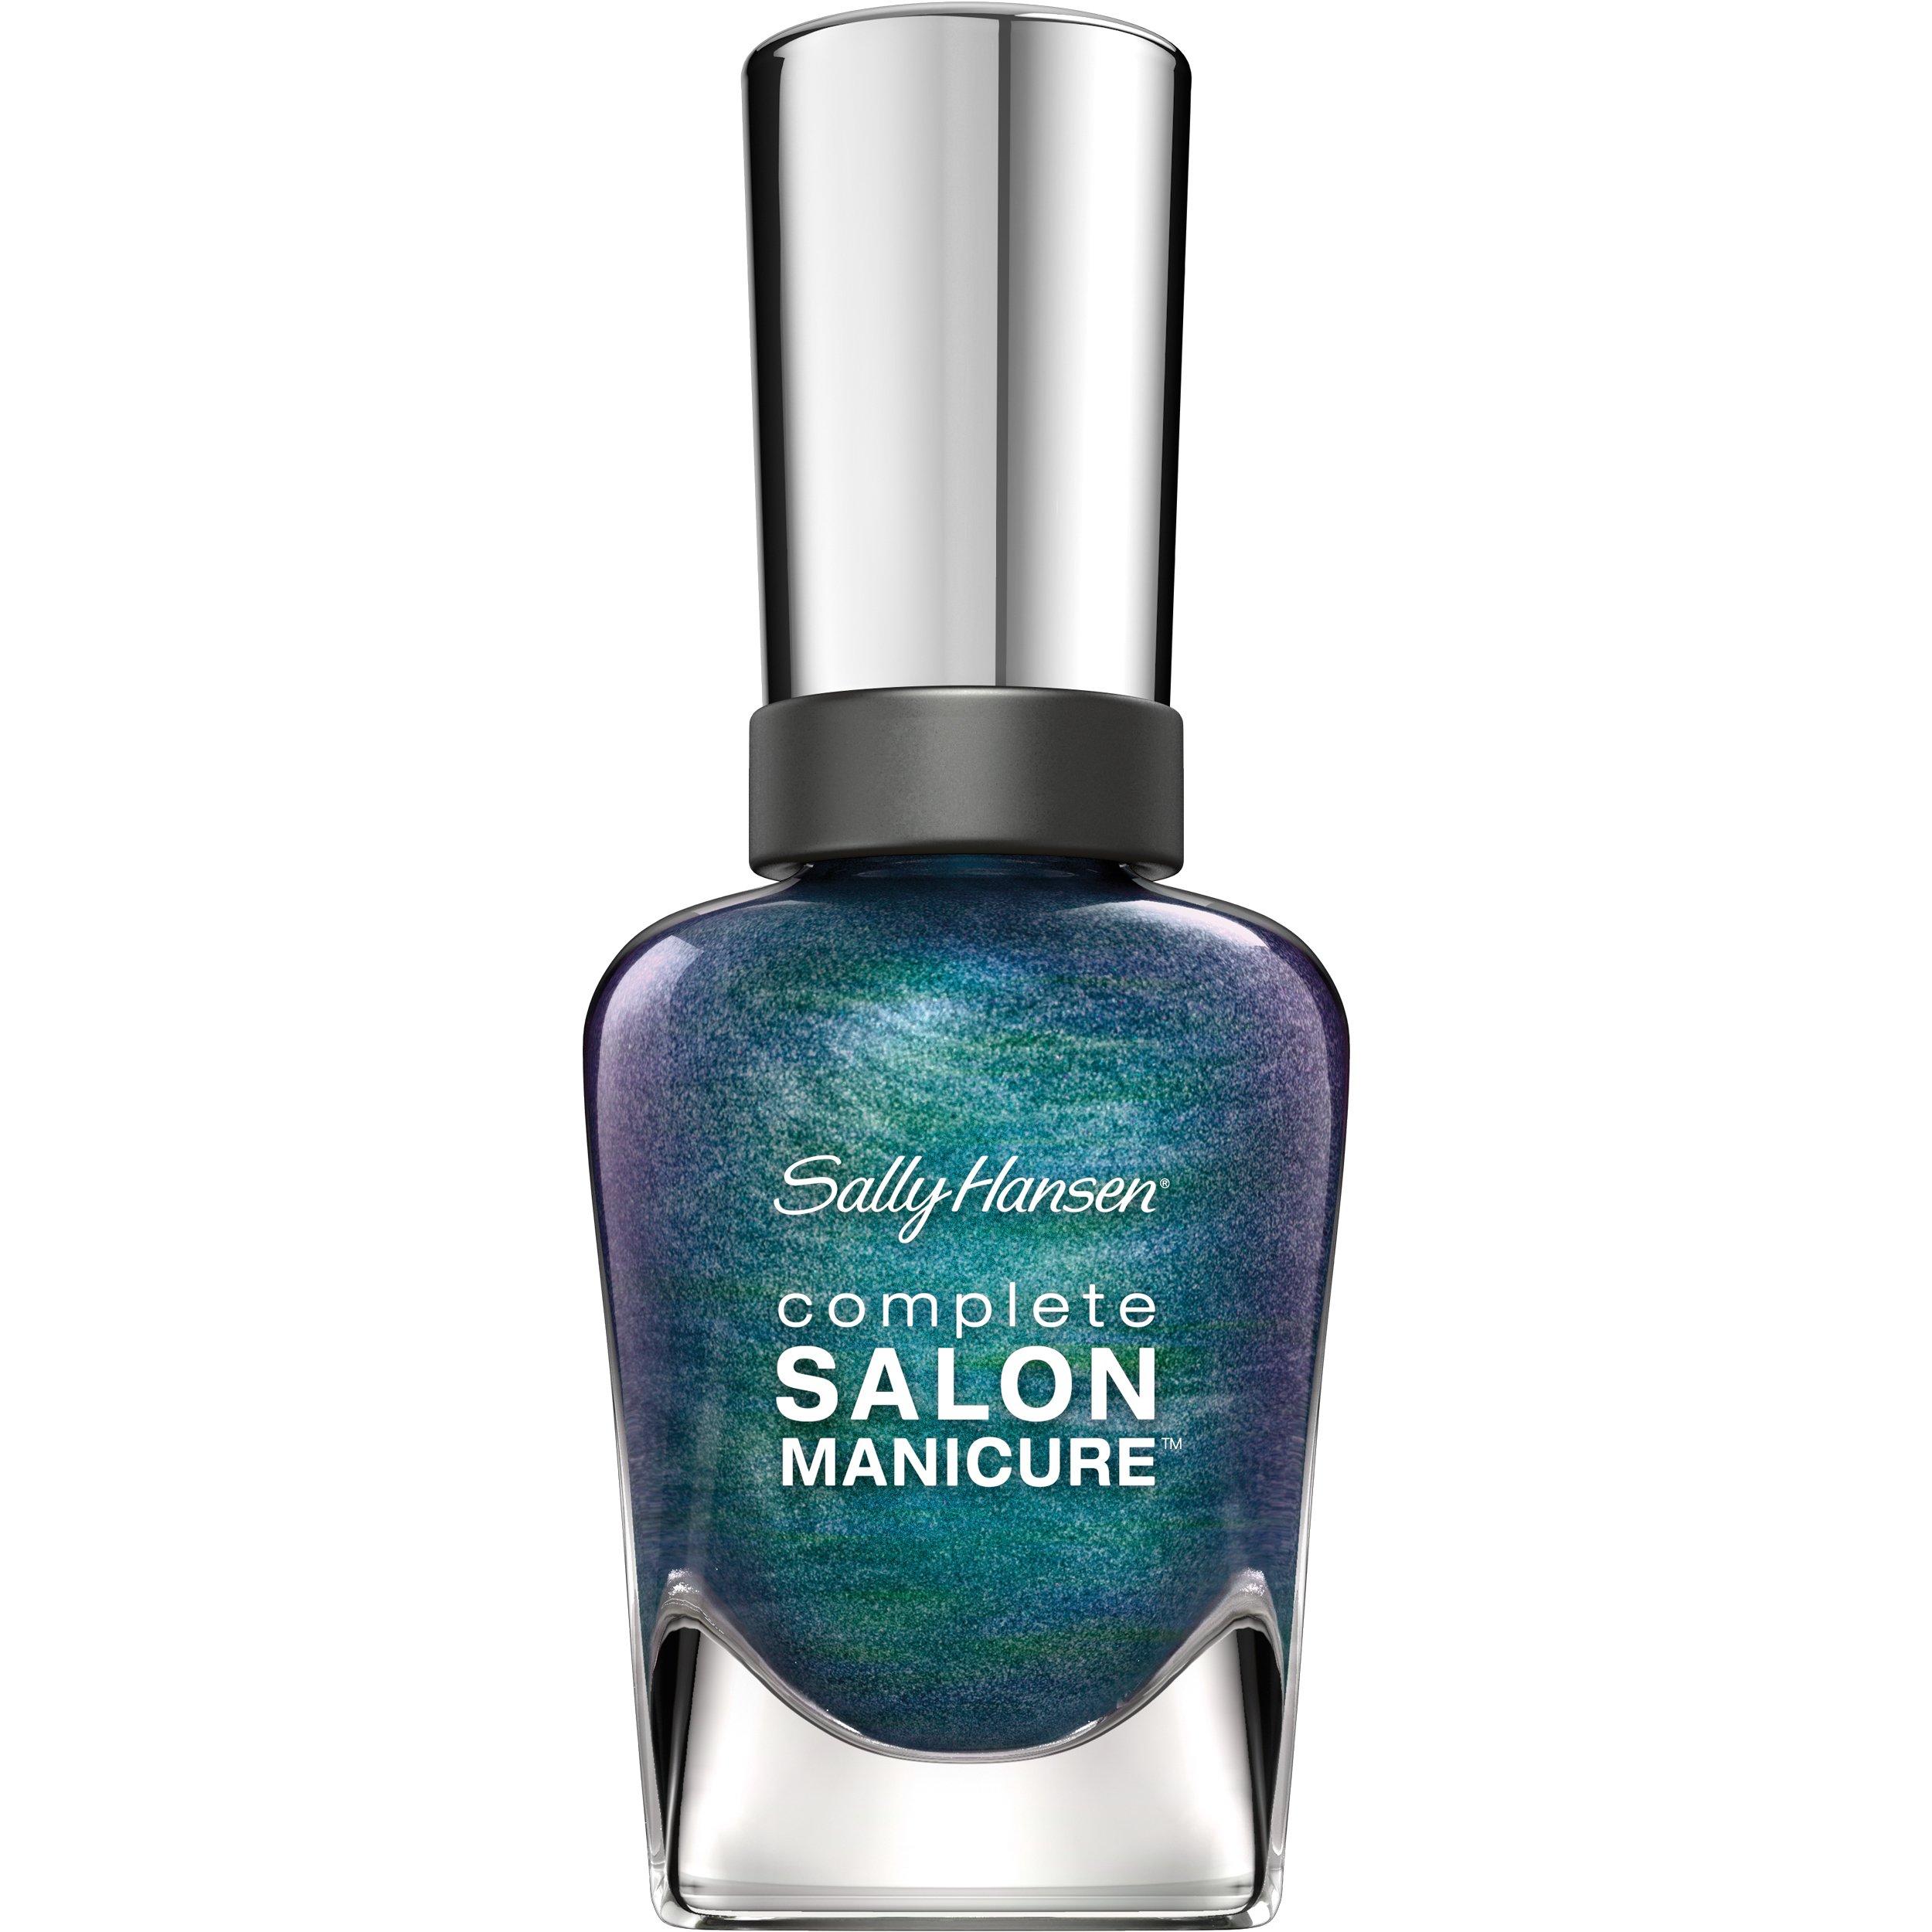 Sally Hansen Complete Salon Manicure Nail Polish, Black and Blue, 0.5 Fluid Ounce